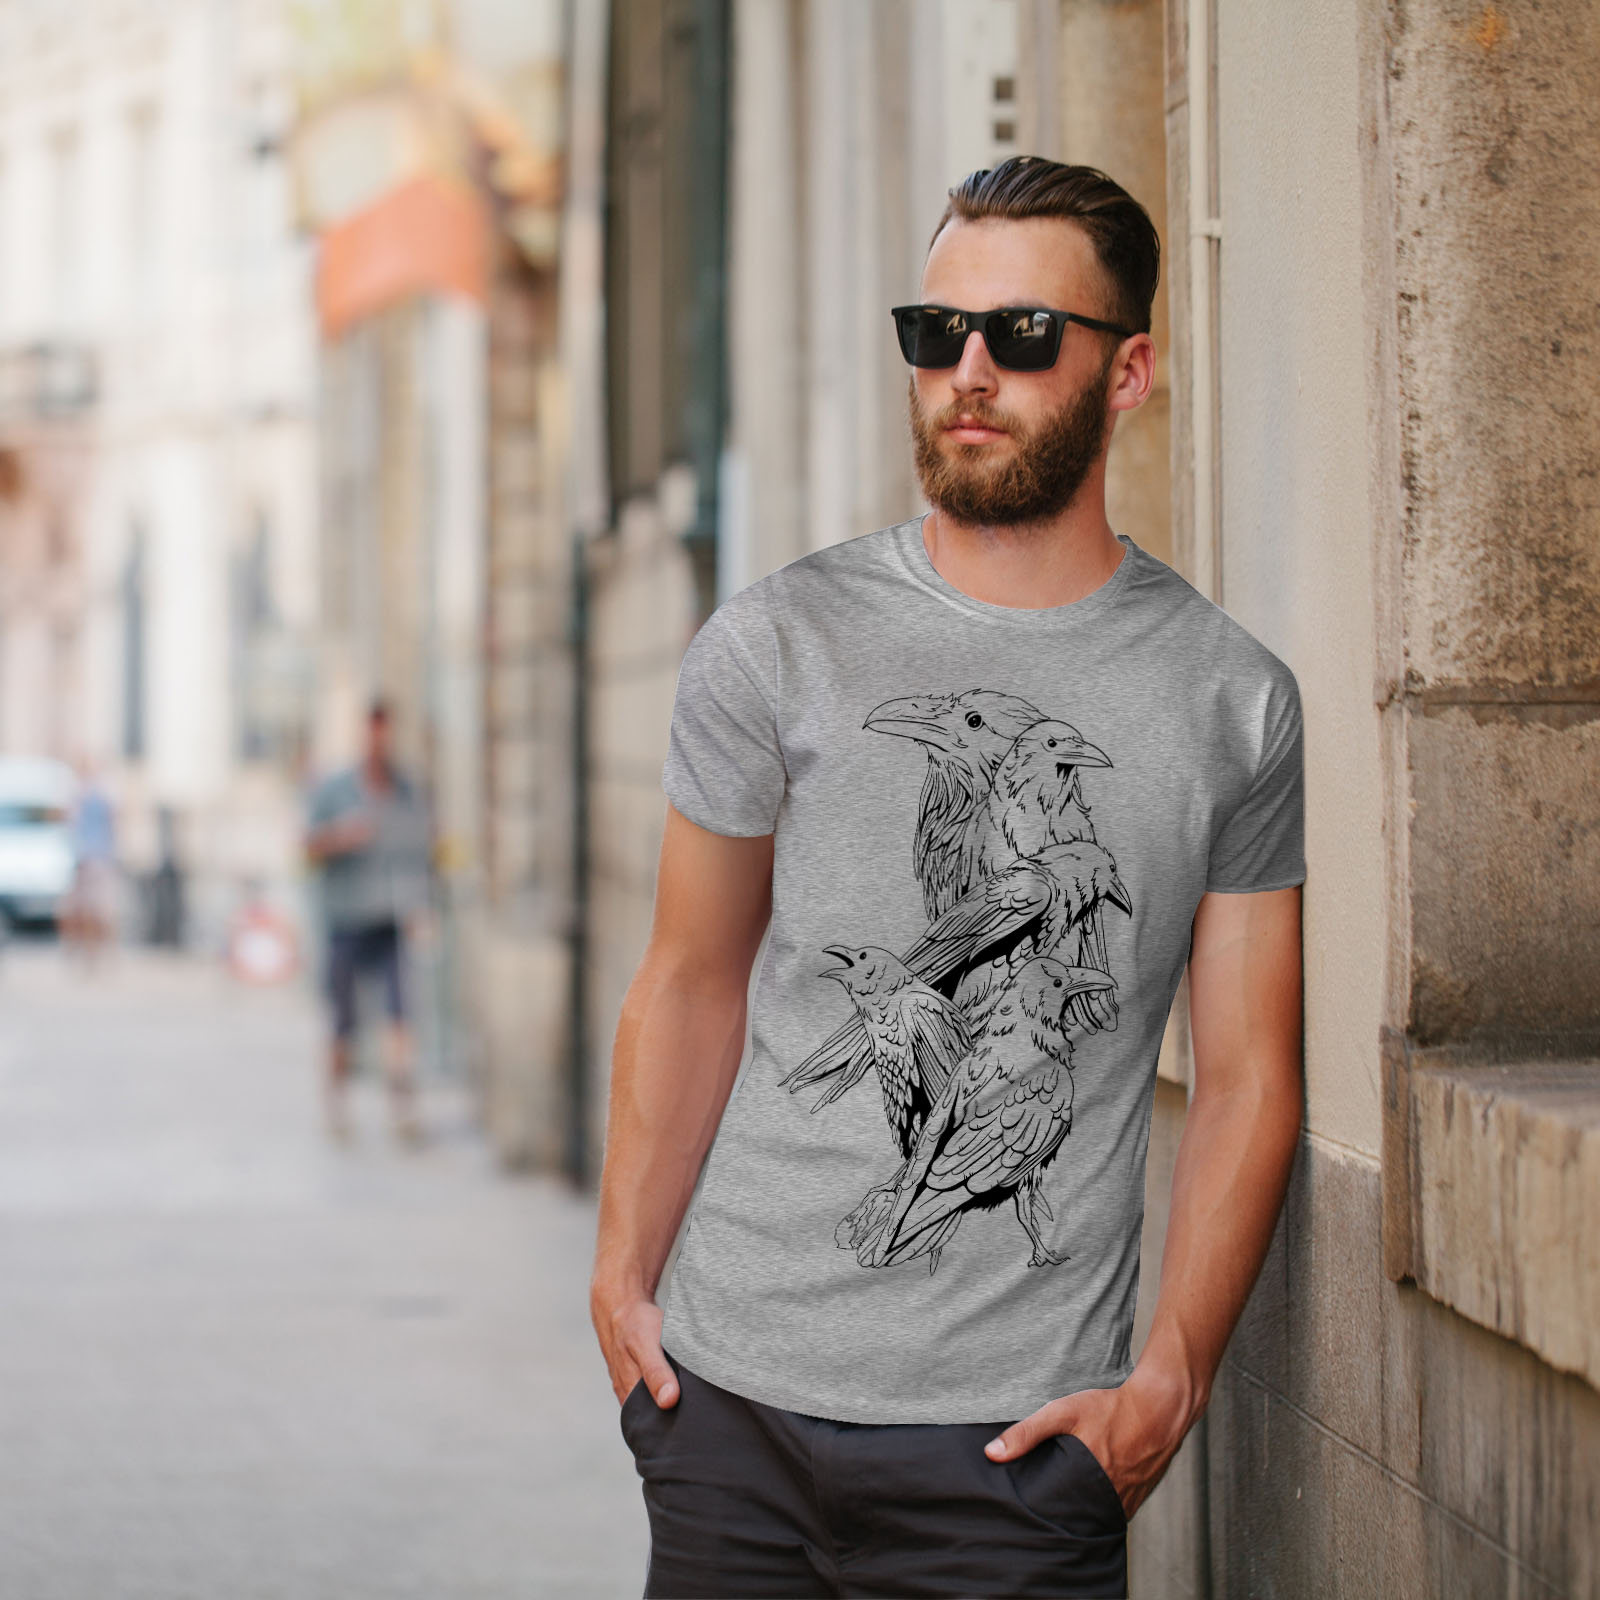 miniature 17 - Wellcoda Four Scary Raven Mens T-shirt, Crow Birds Graphic Design Printed Tee